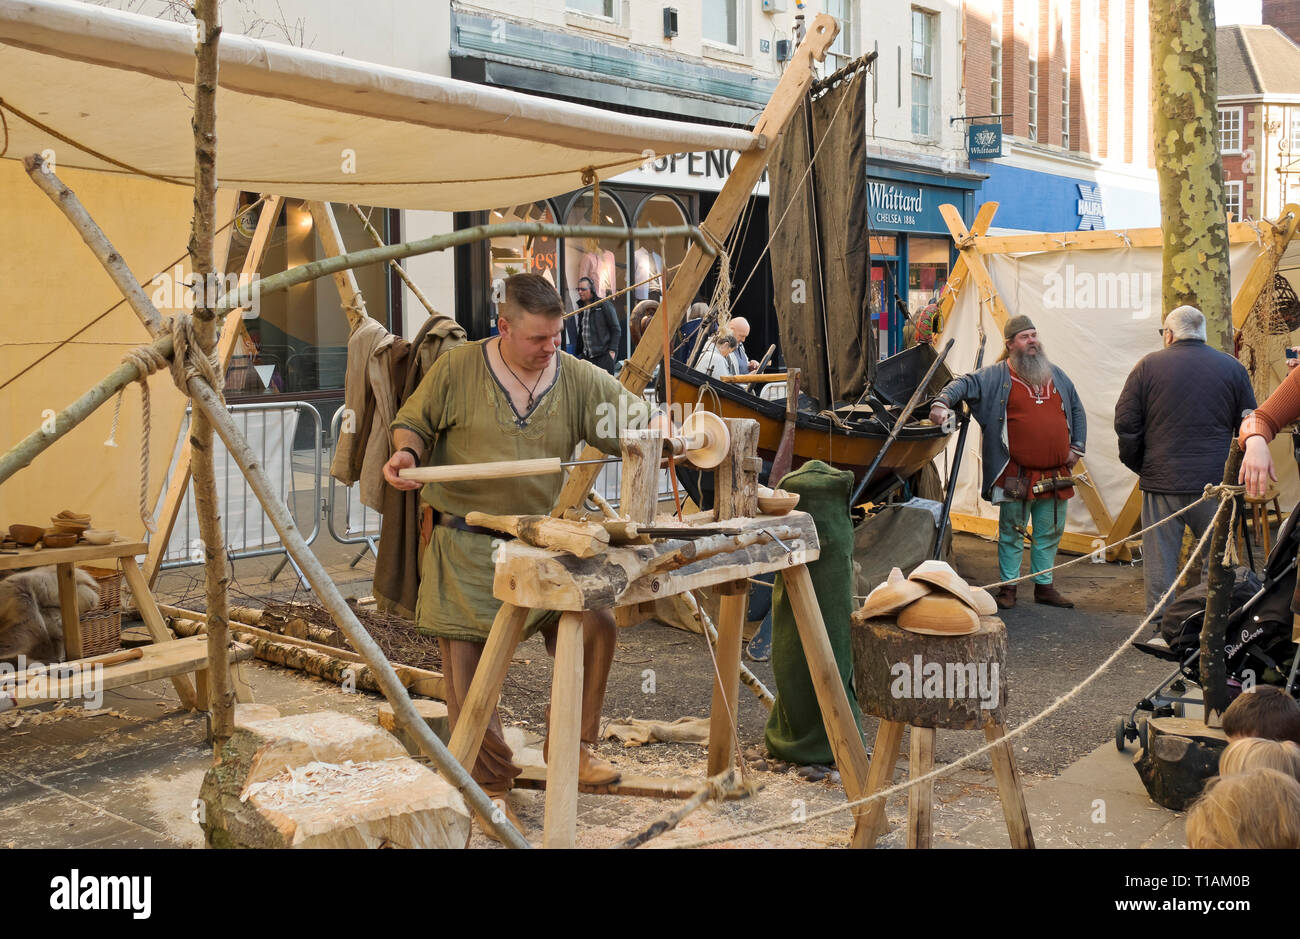 Man demonstrating wood turning at the Viking Festival York North Yorkshire England UK United Kingdom GB Great Britain Stock Photo